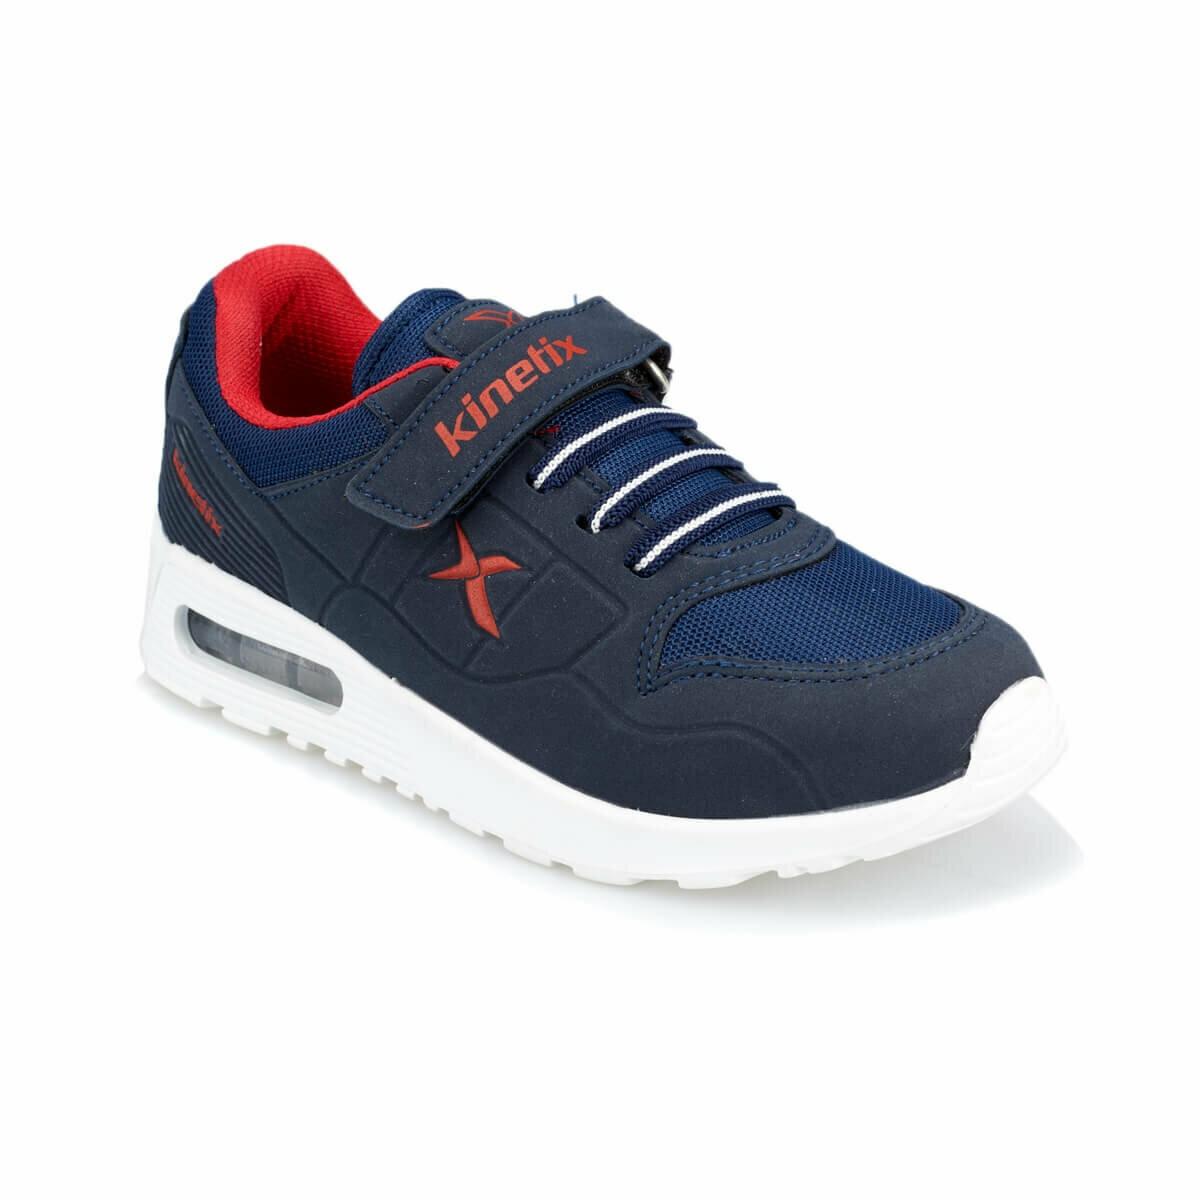 FLO BIRNO Navy Blue Male Child Sneaker Shoes KINETIX